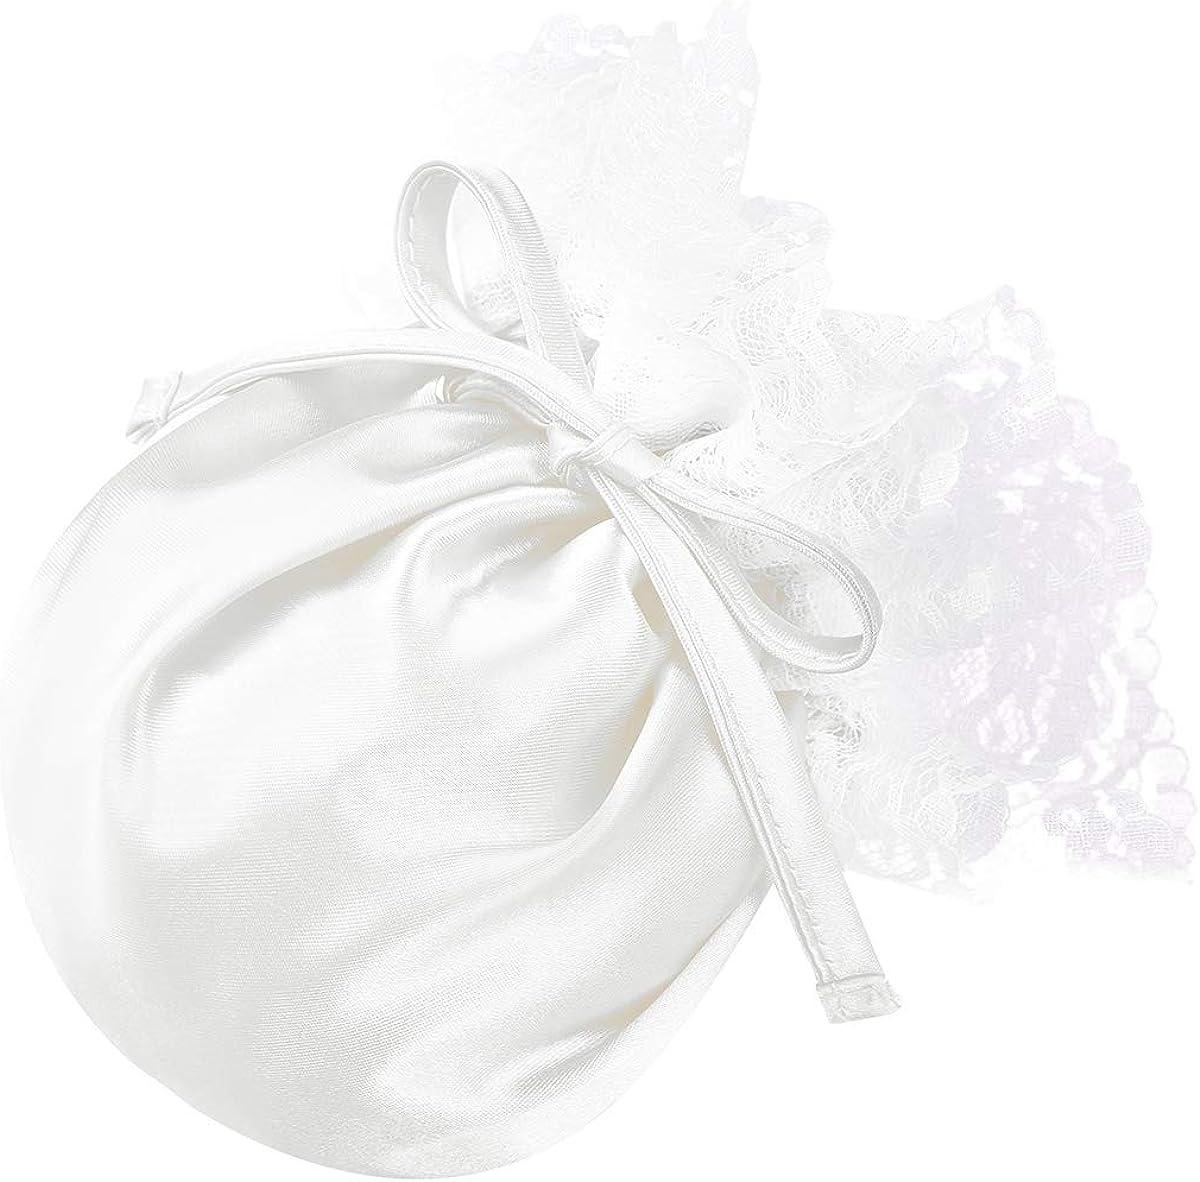 YOOJIA Men's Satin Floral Lace Sissy C-String Max 47% OFF Max 45% OFF Drawstring Panties